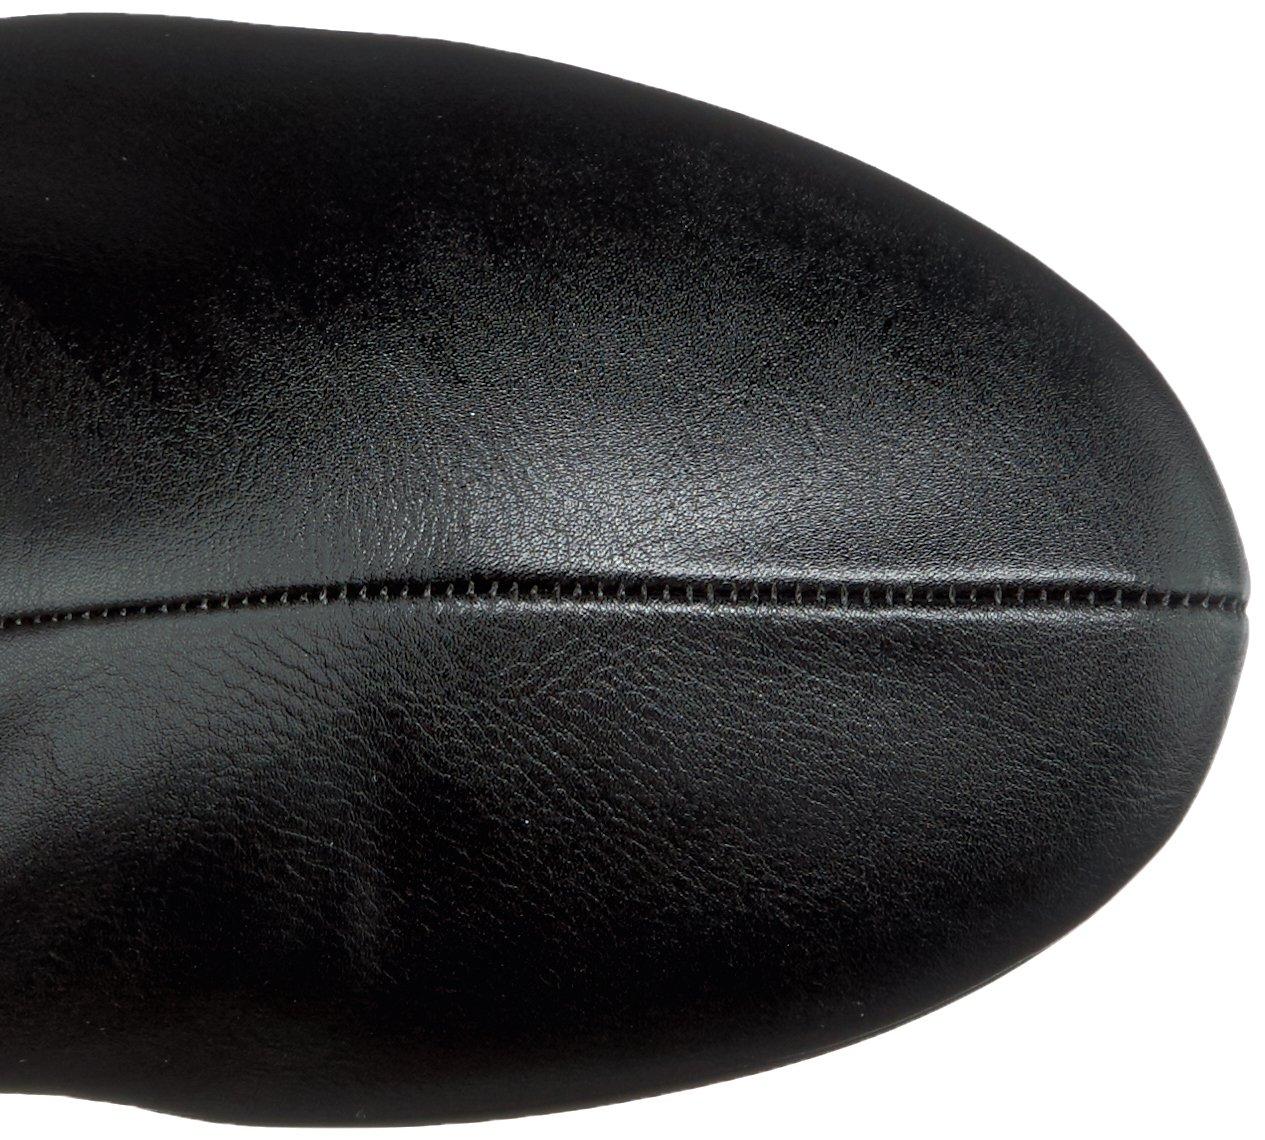 Aerosoles Women's Quick Role Knee High Boot B074GFV66M 8.5 W US|Black